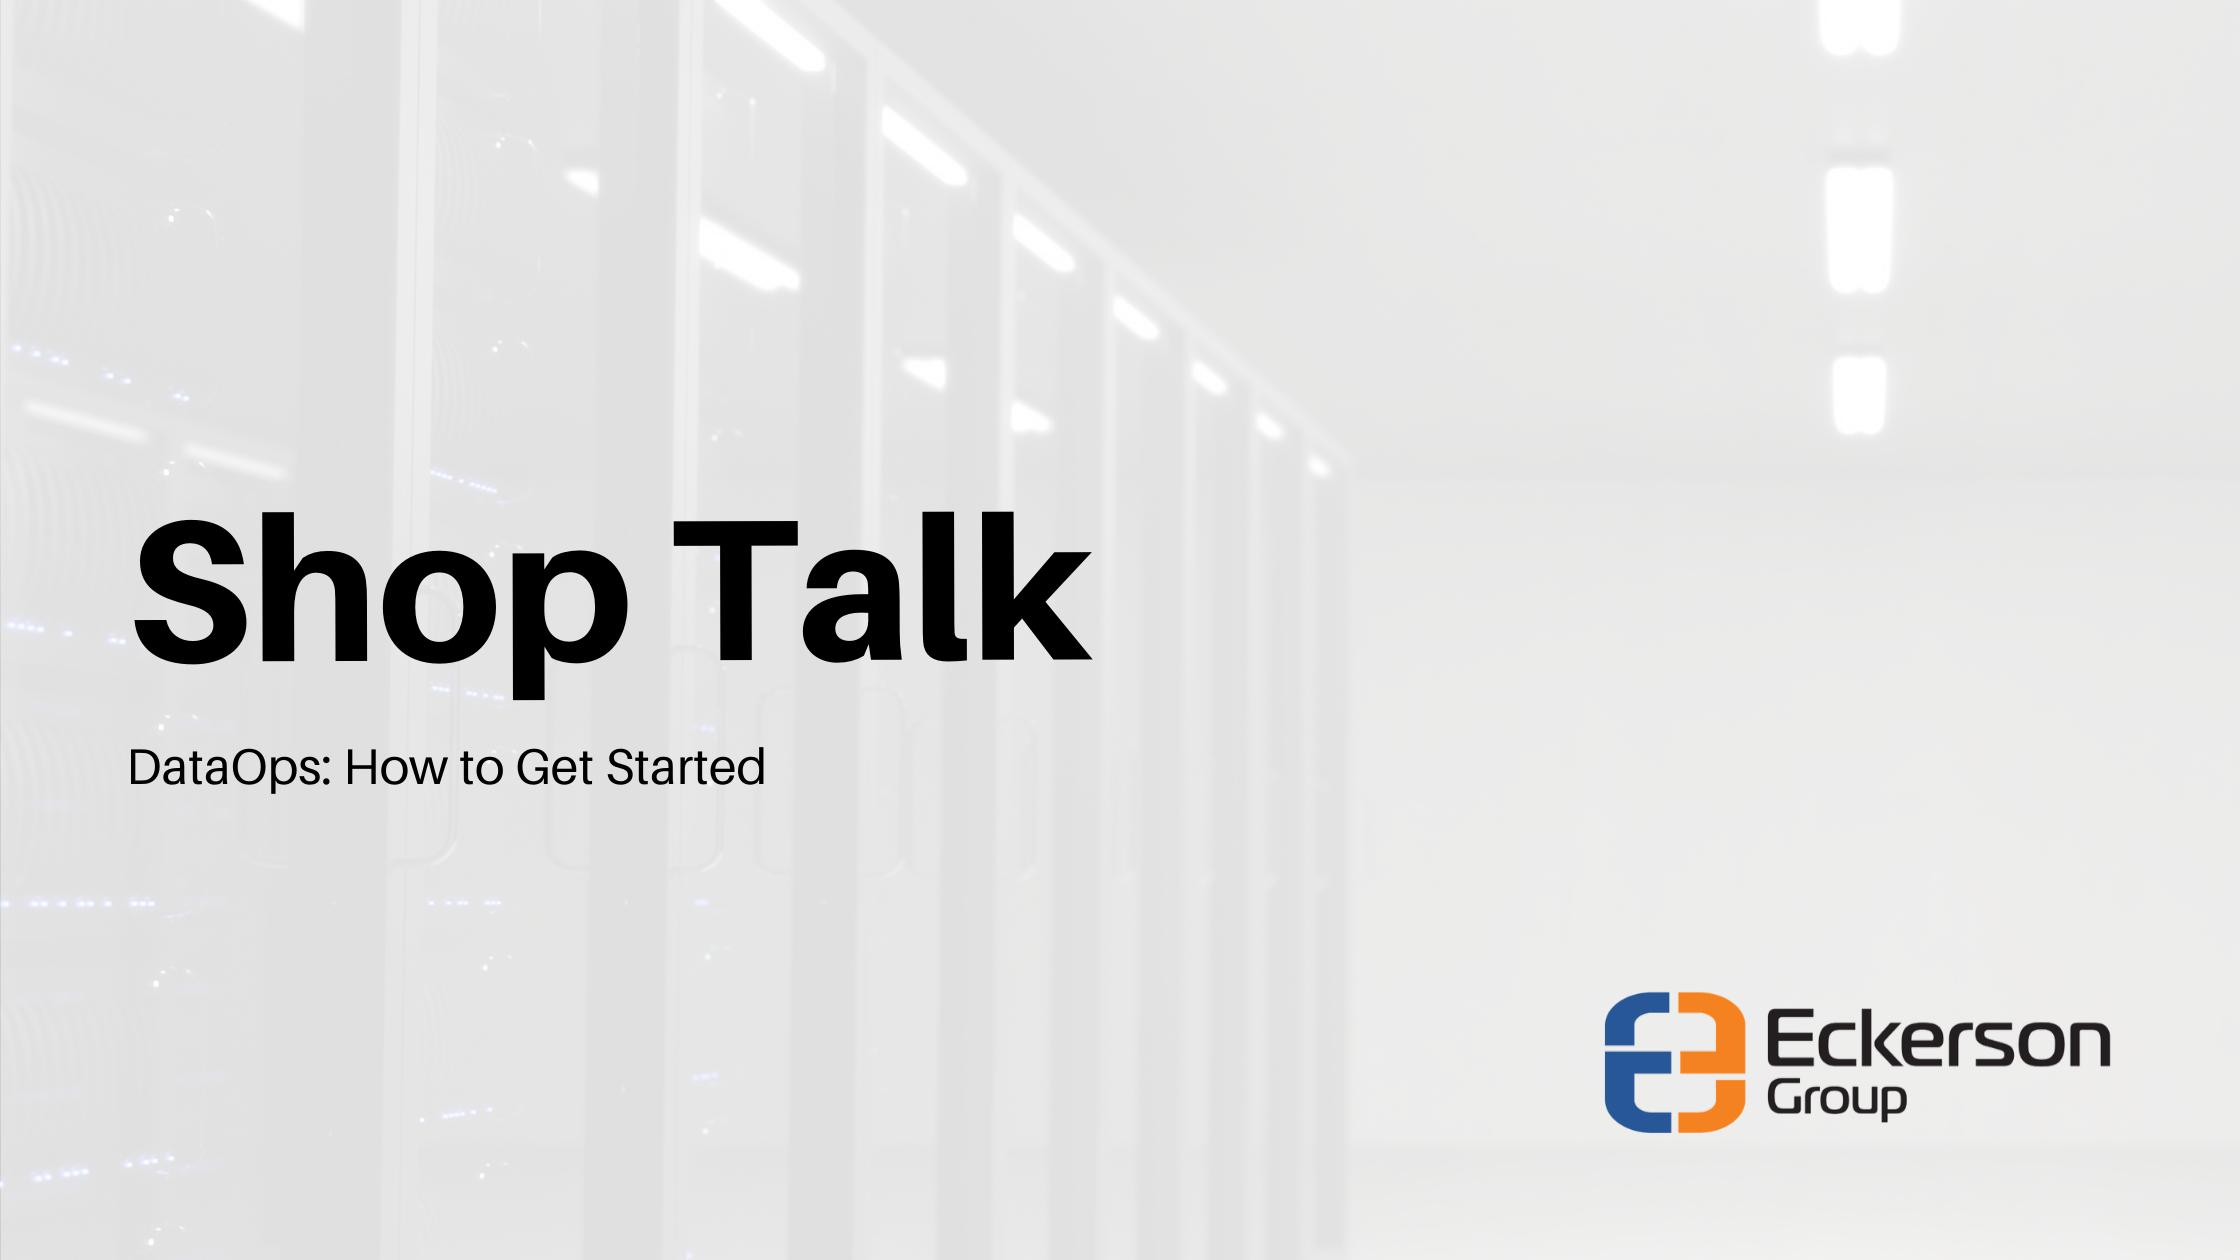 Eckerson Group - Shop Talk Cover